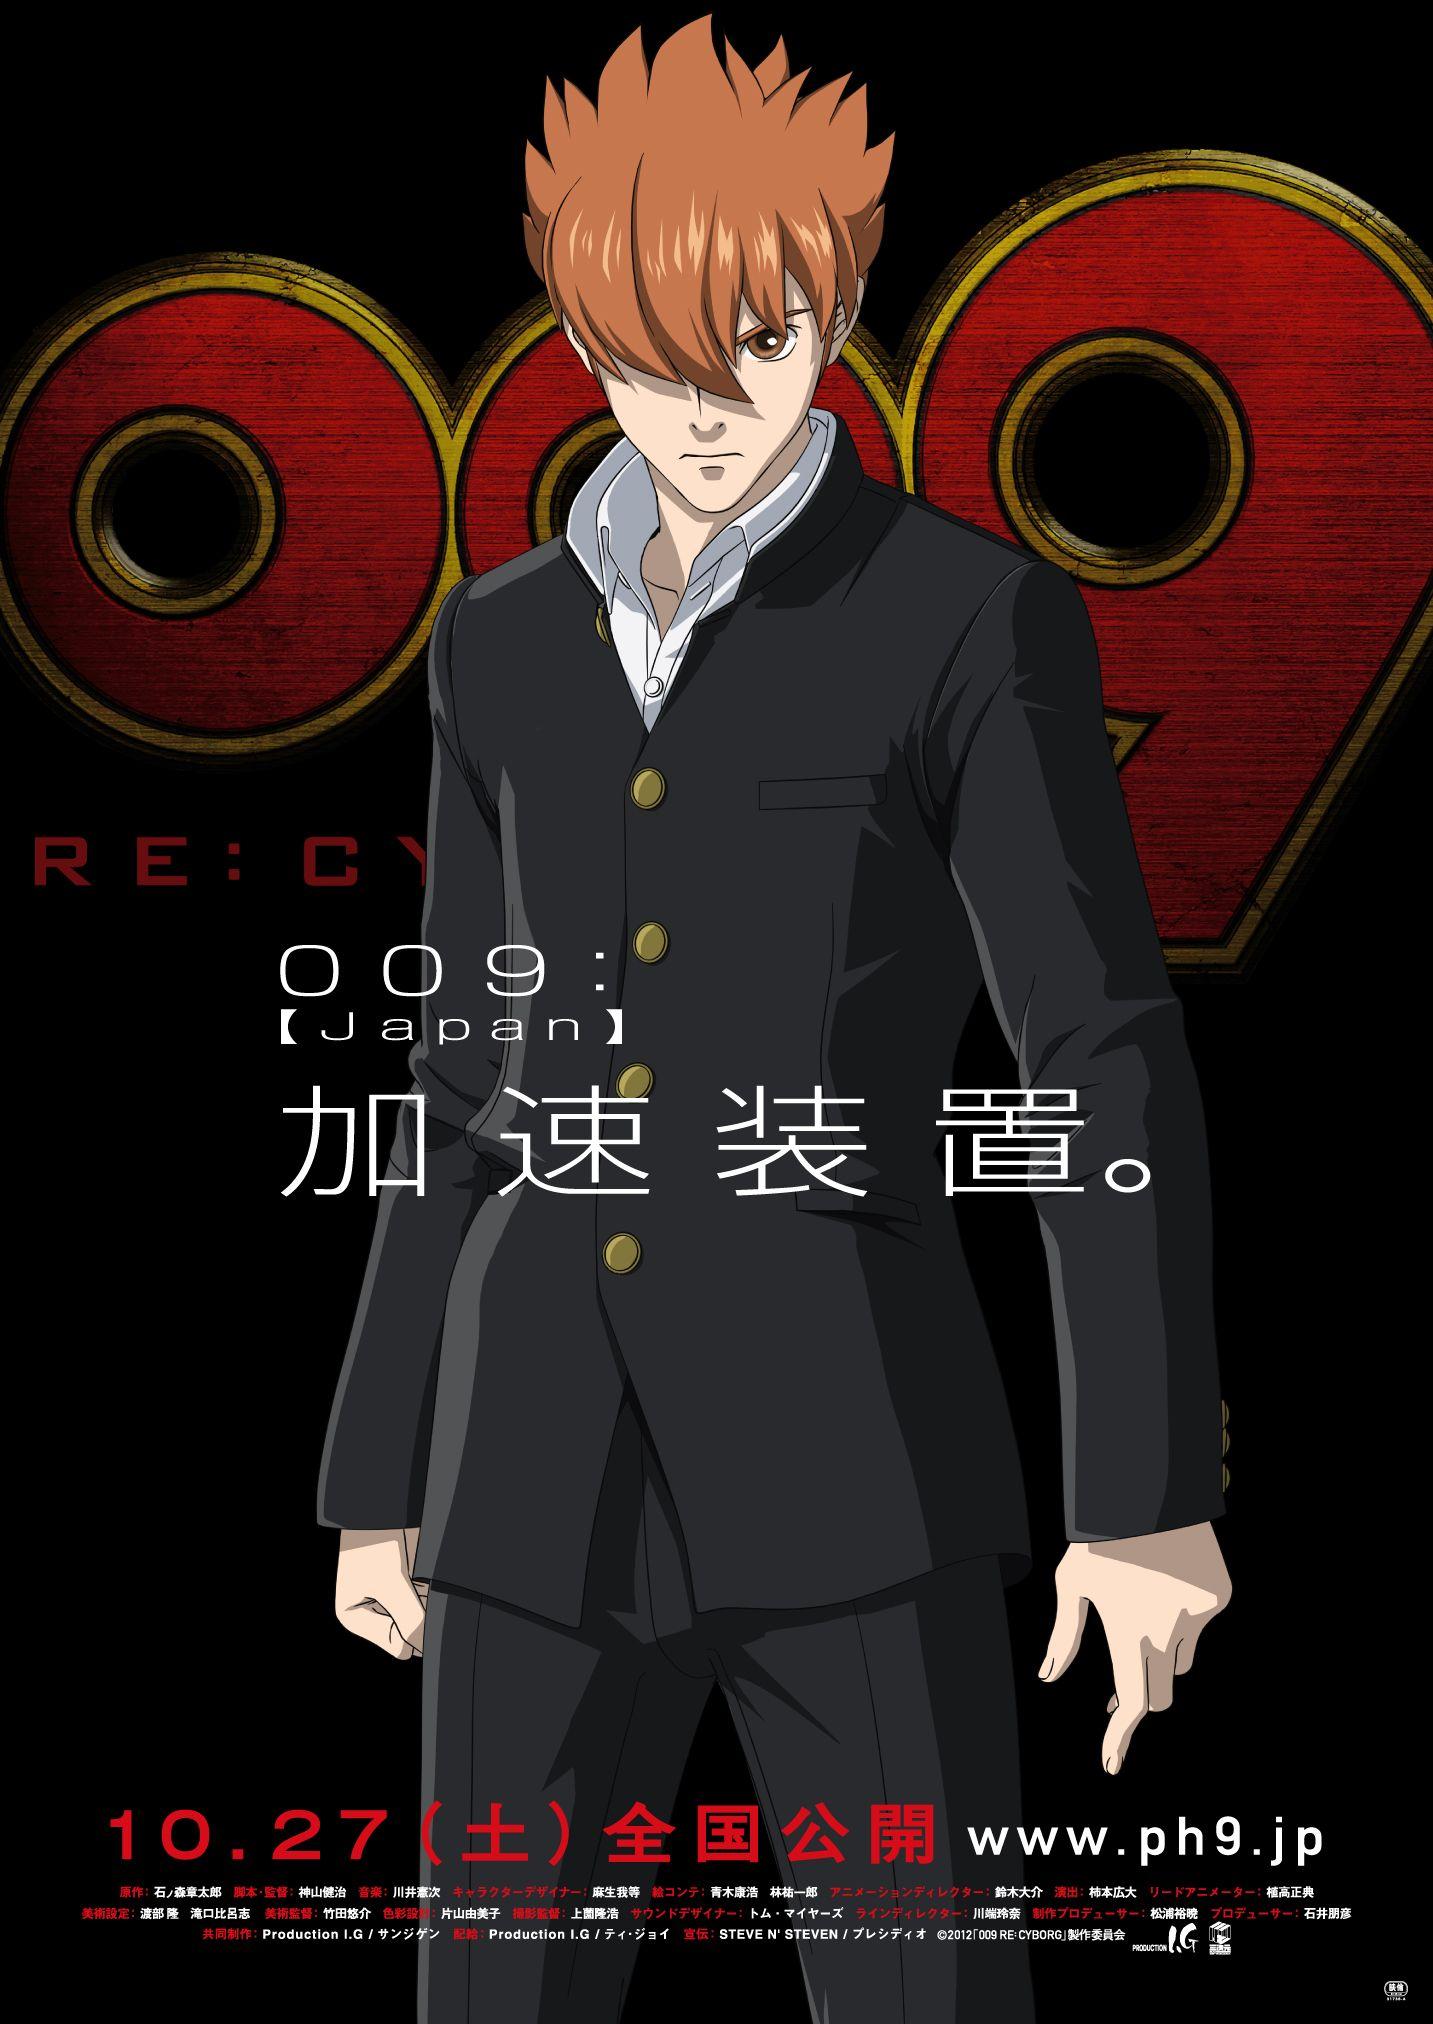 Introduction to Original English Language Manga